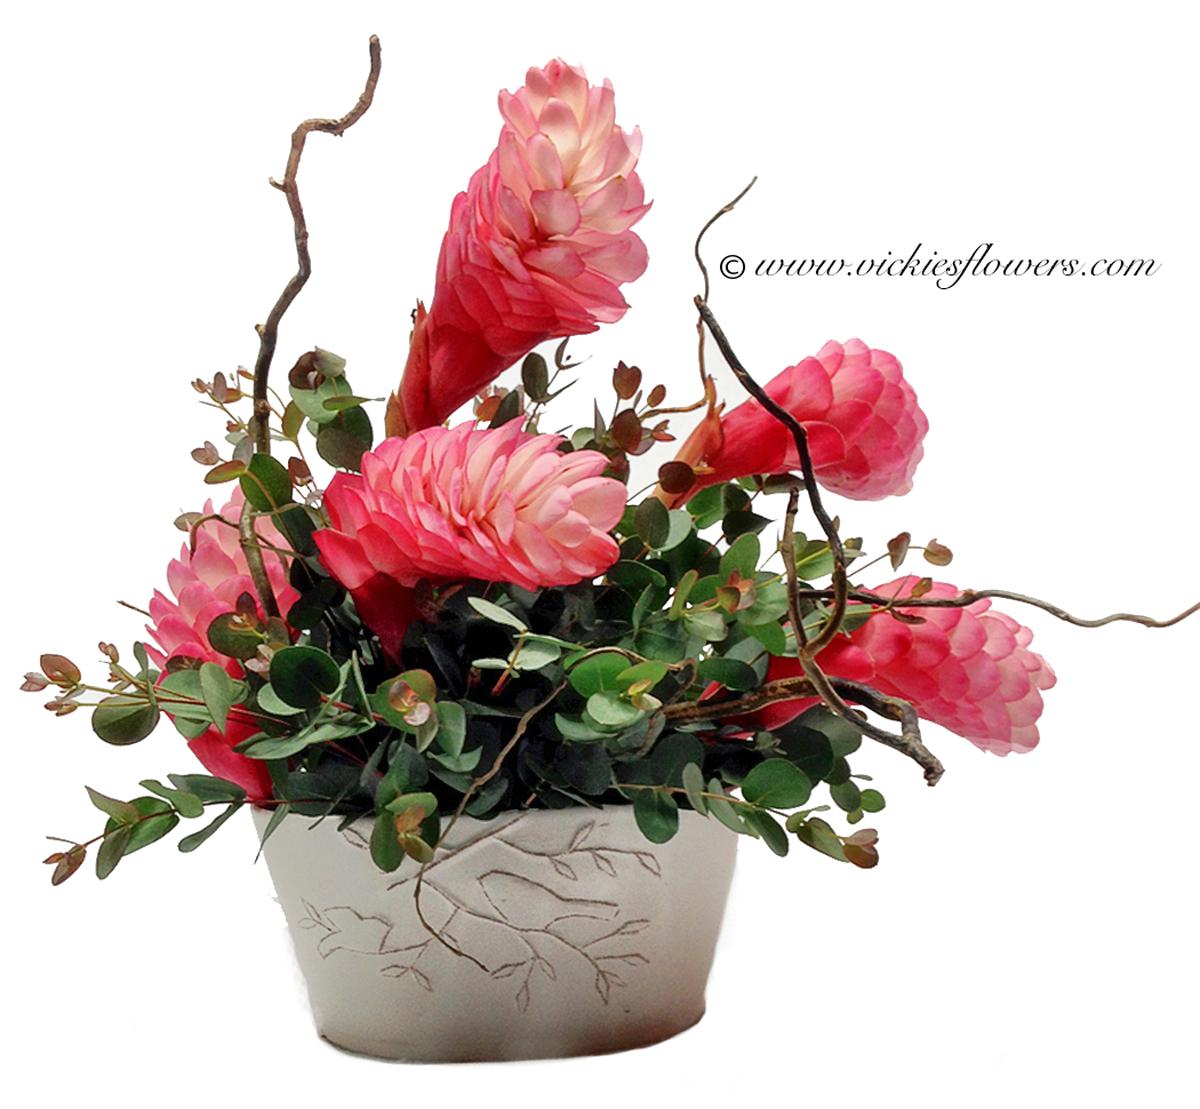 Ikebana Asian Flower Arrangements Vickies Flowers Brighton Co Florist